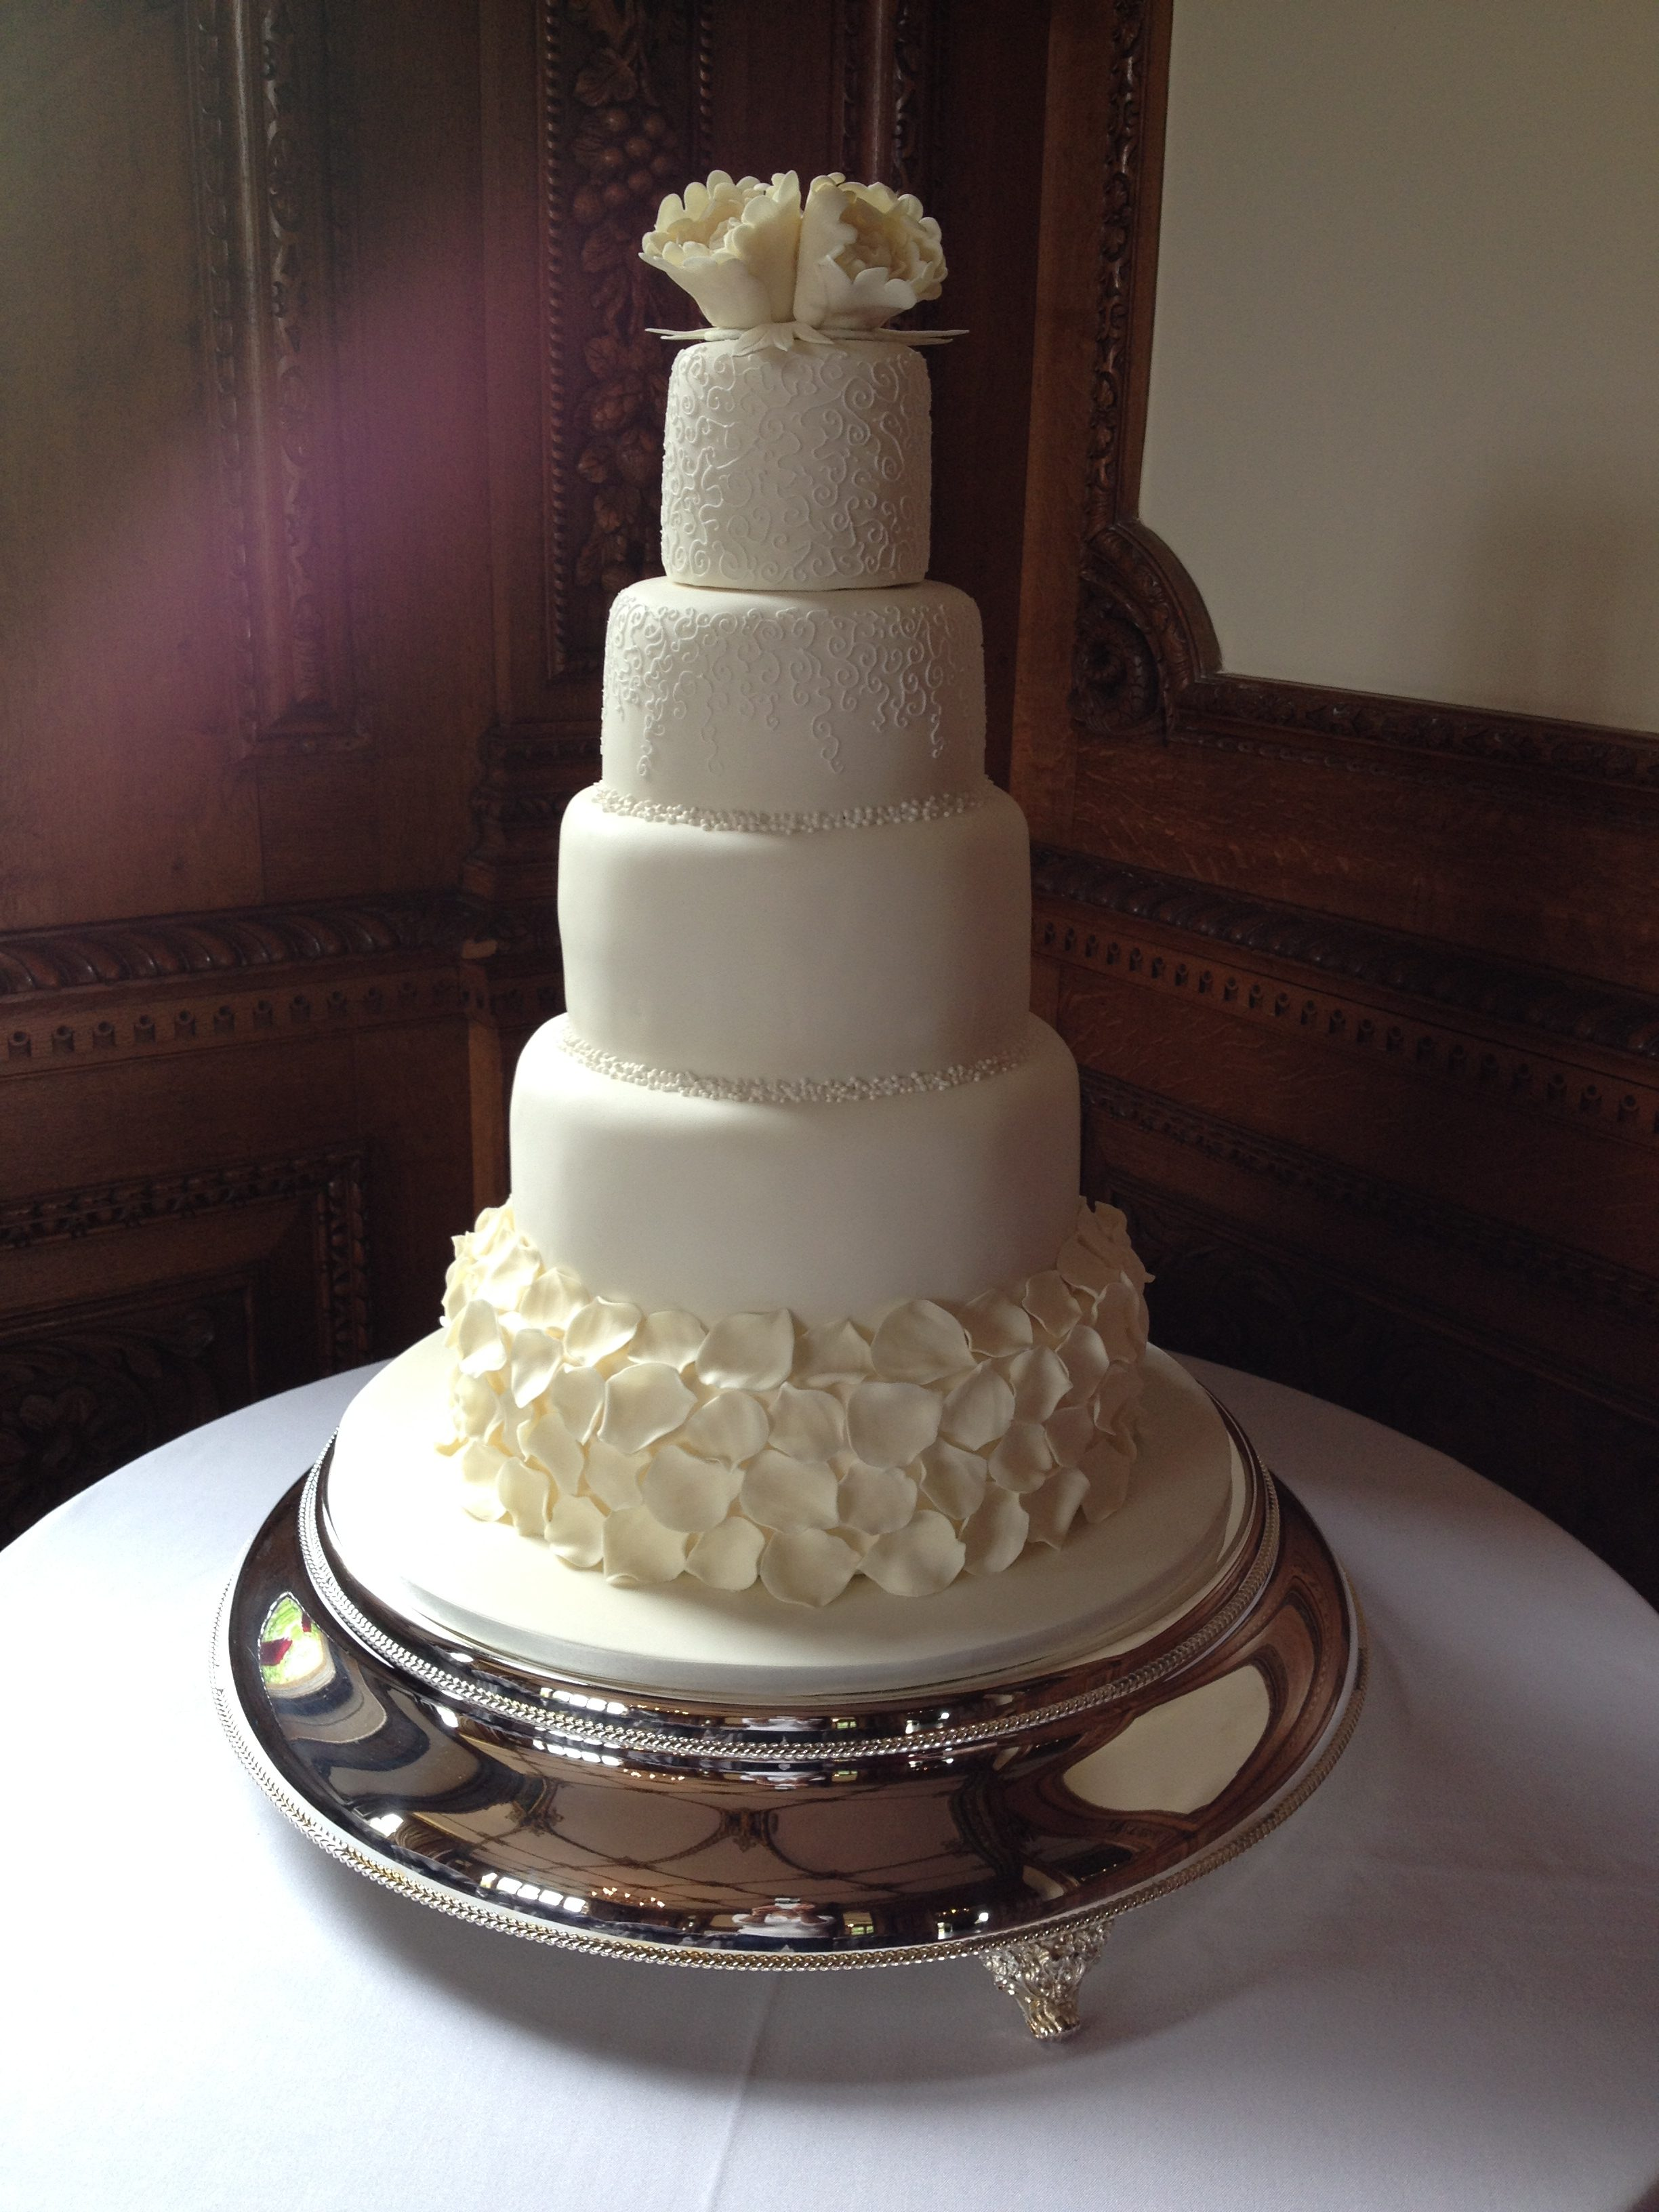 Petals & Filigree Wedding Cake